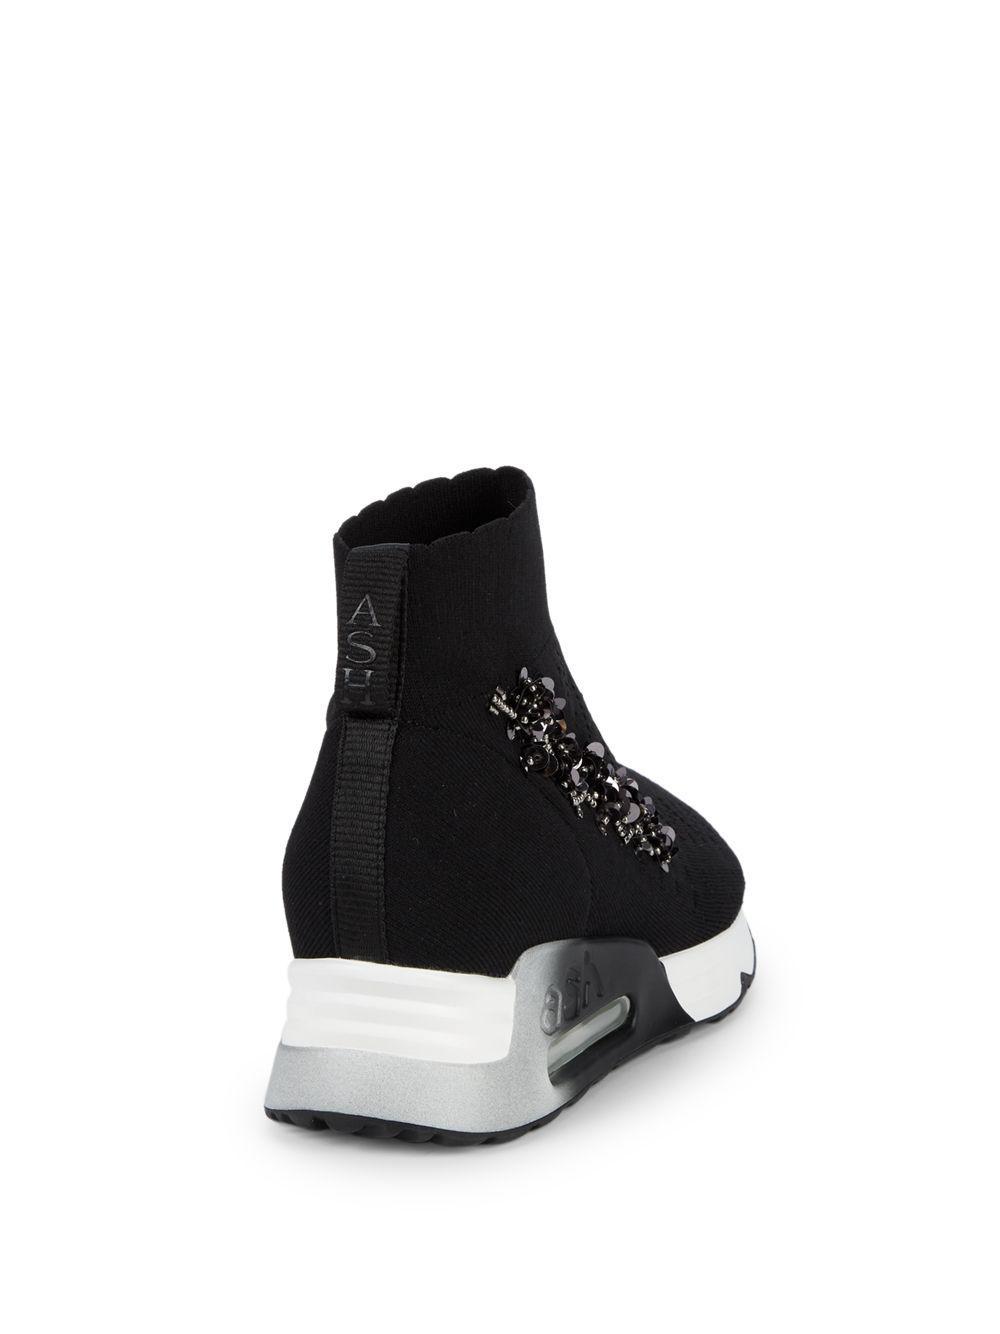 e124985e86d50 Ash - Black Embellished Sock Sneakers - Lyst. View fullscreen